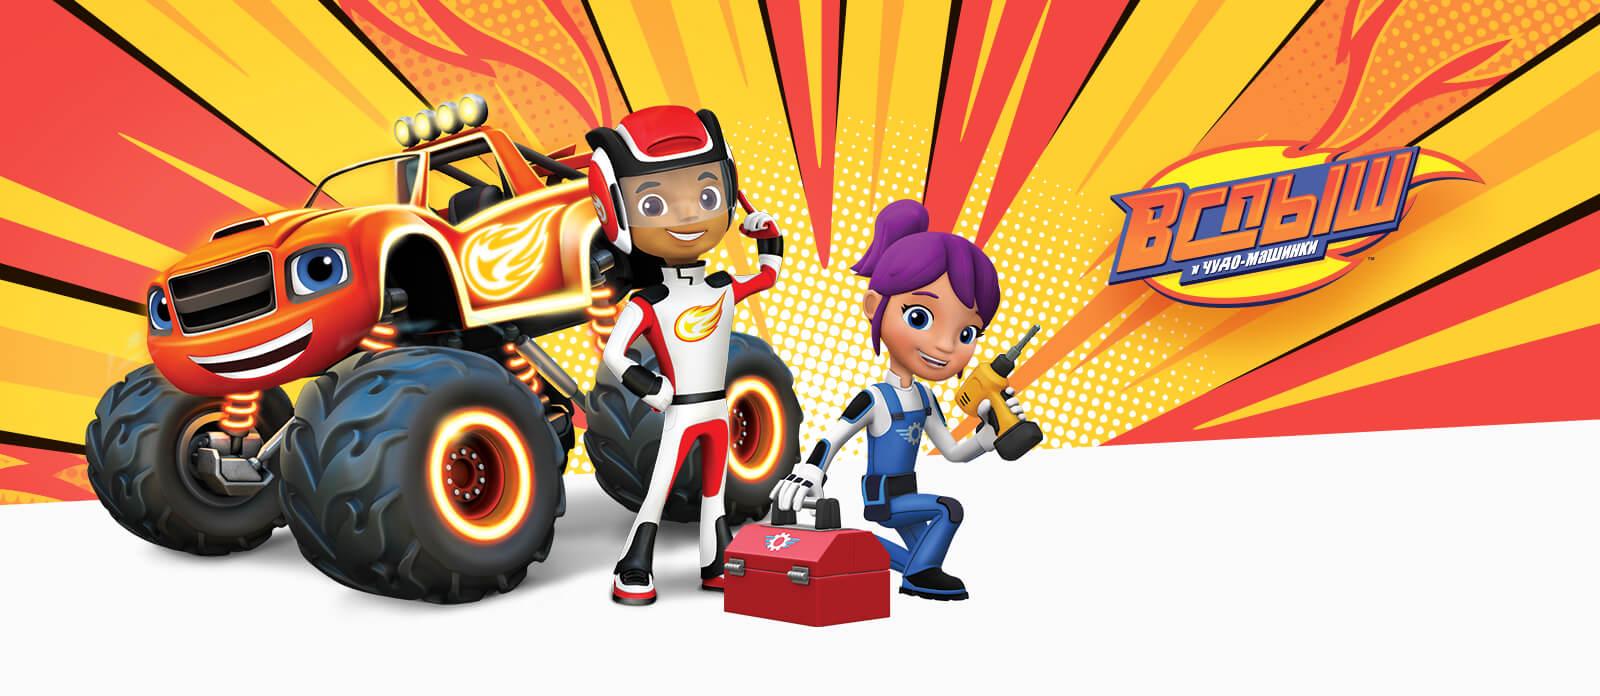 Mattel Blaze DTK24 Blaze Вспыш и его друзья чудо-машинки